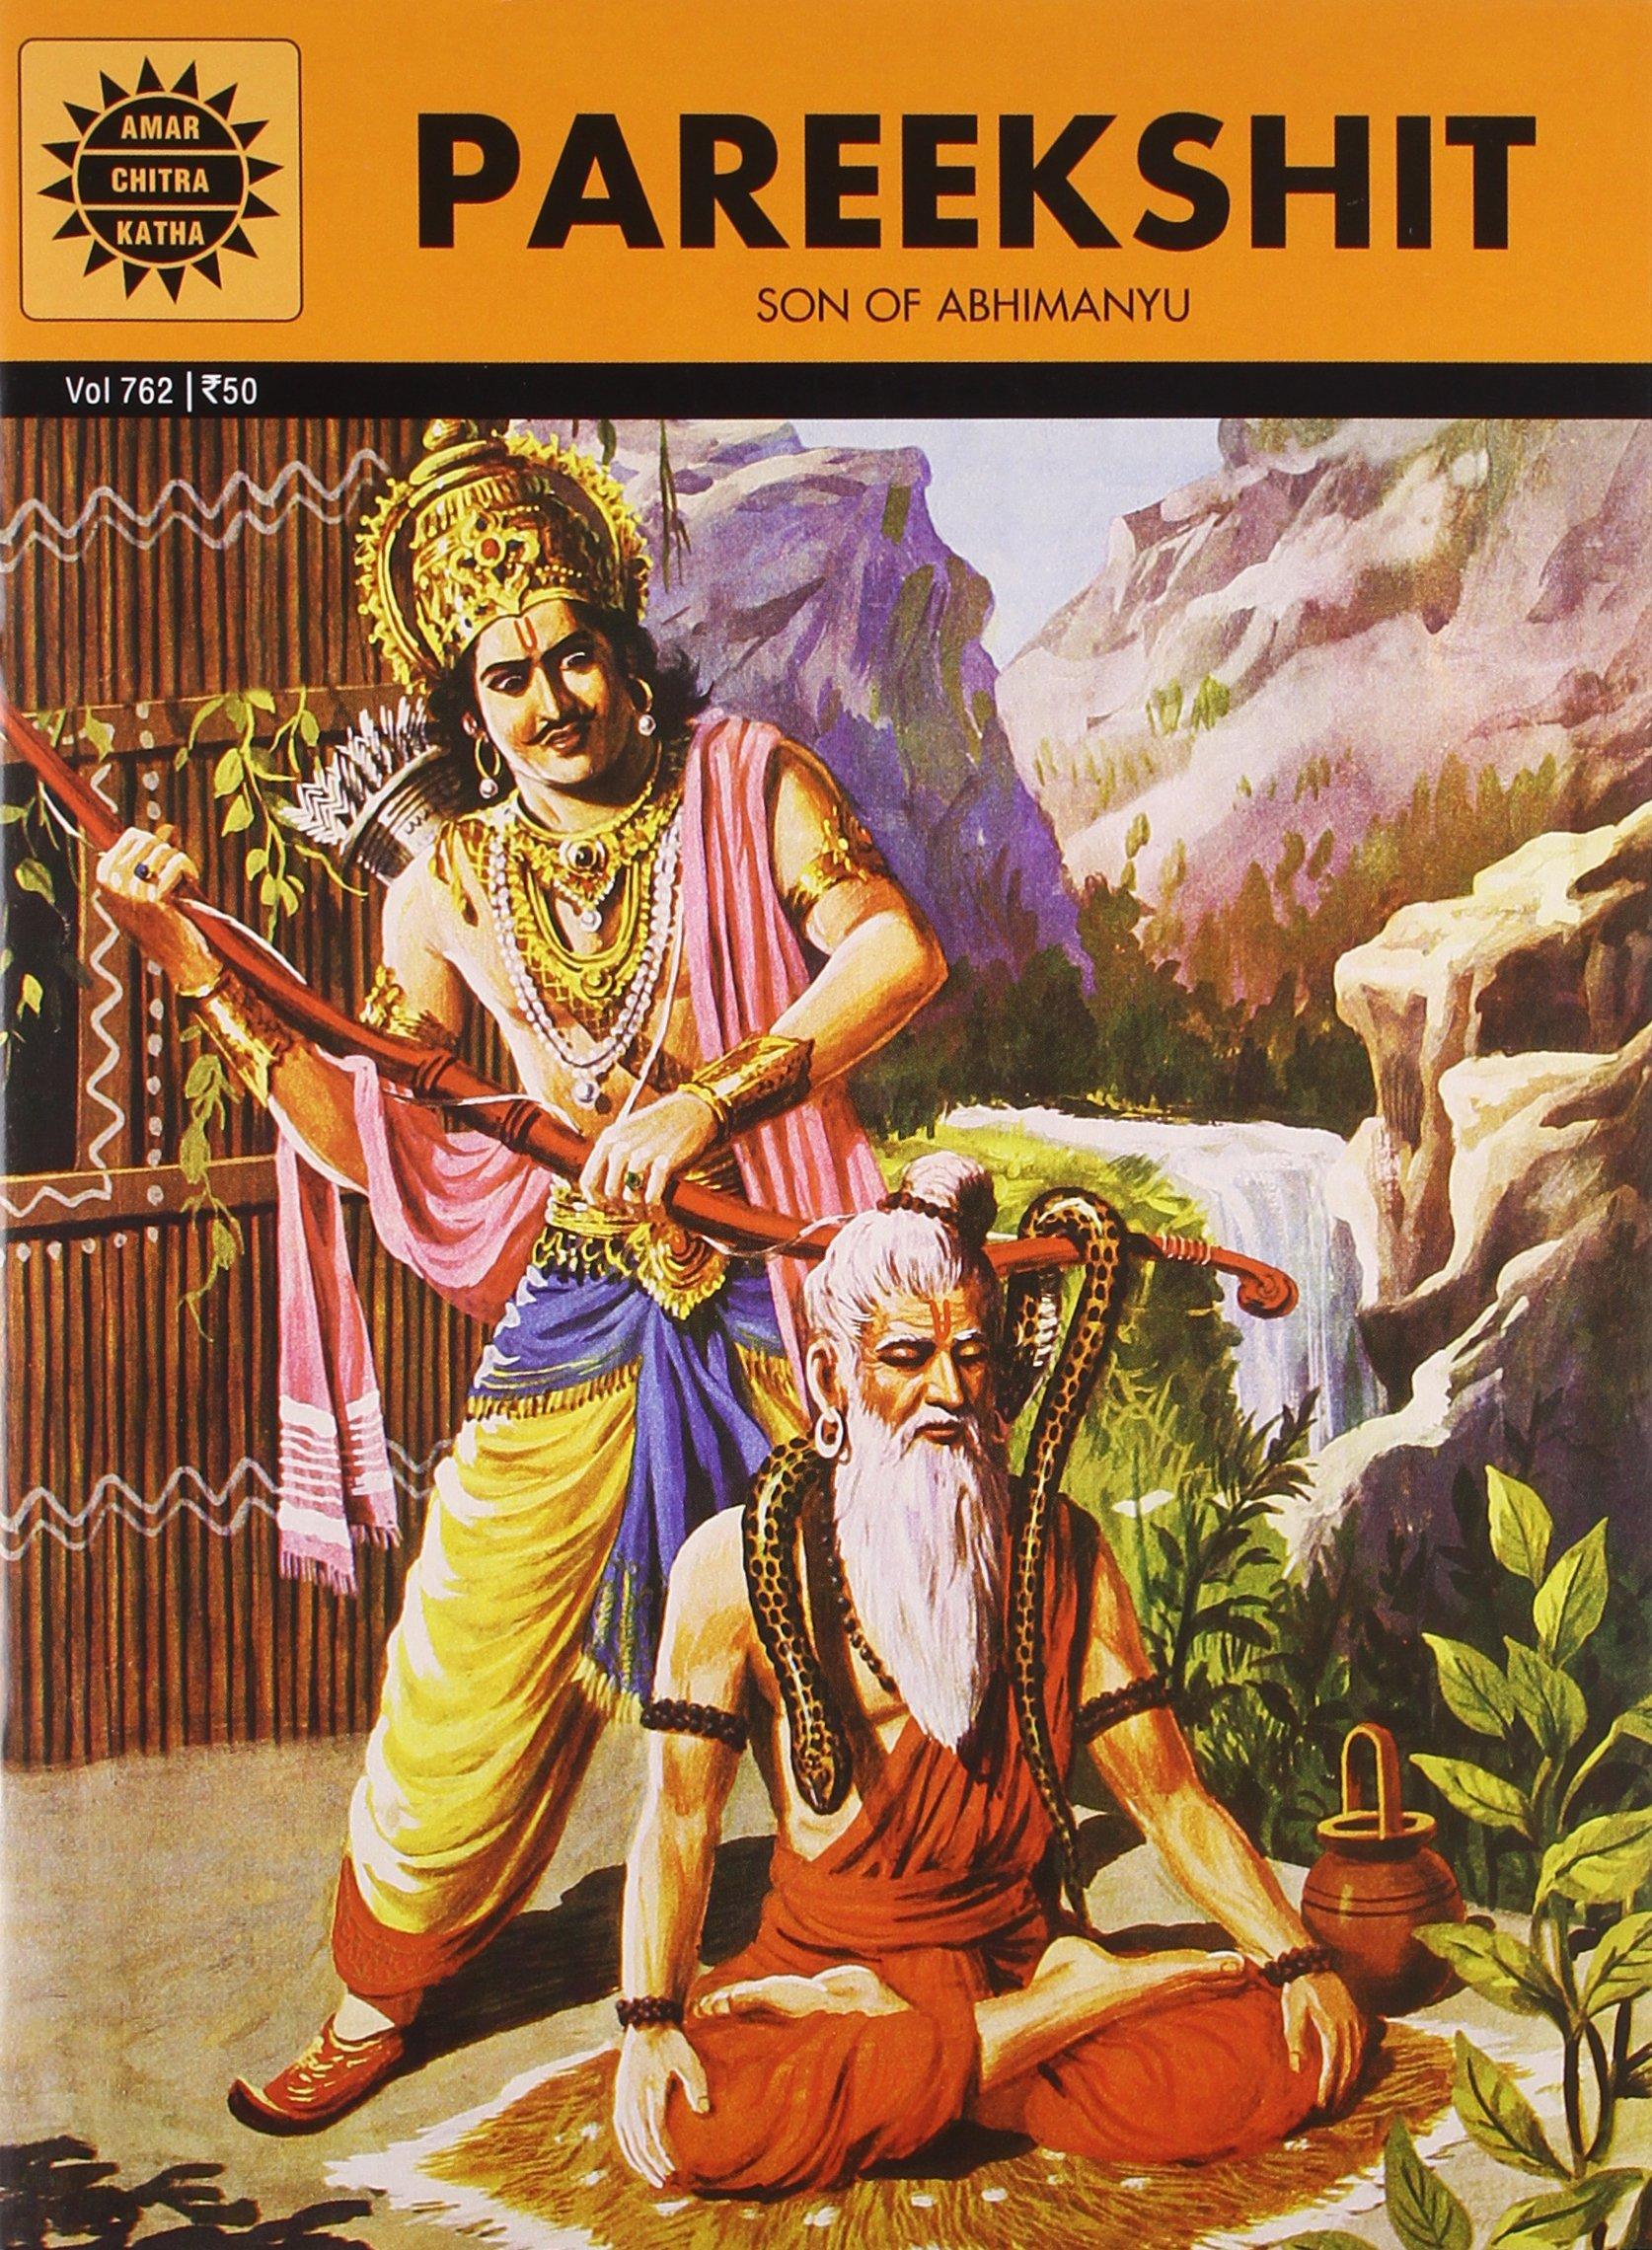 Pareekshit Son of Abhimanyu ebook